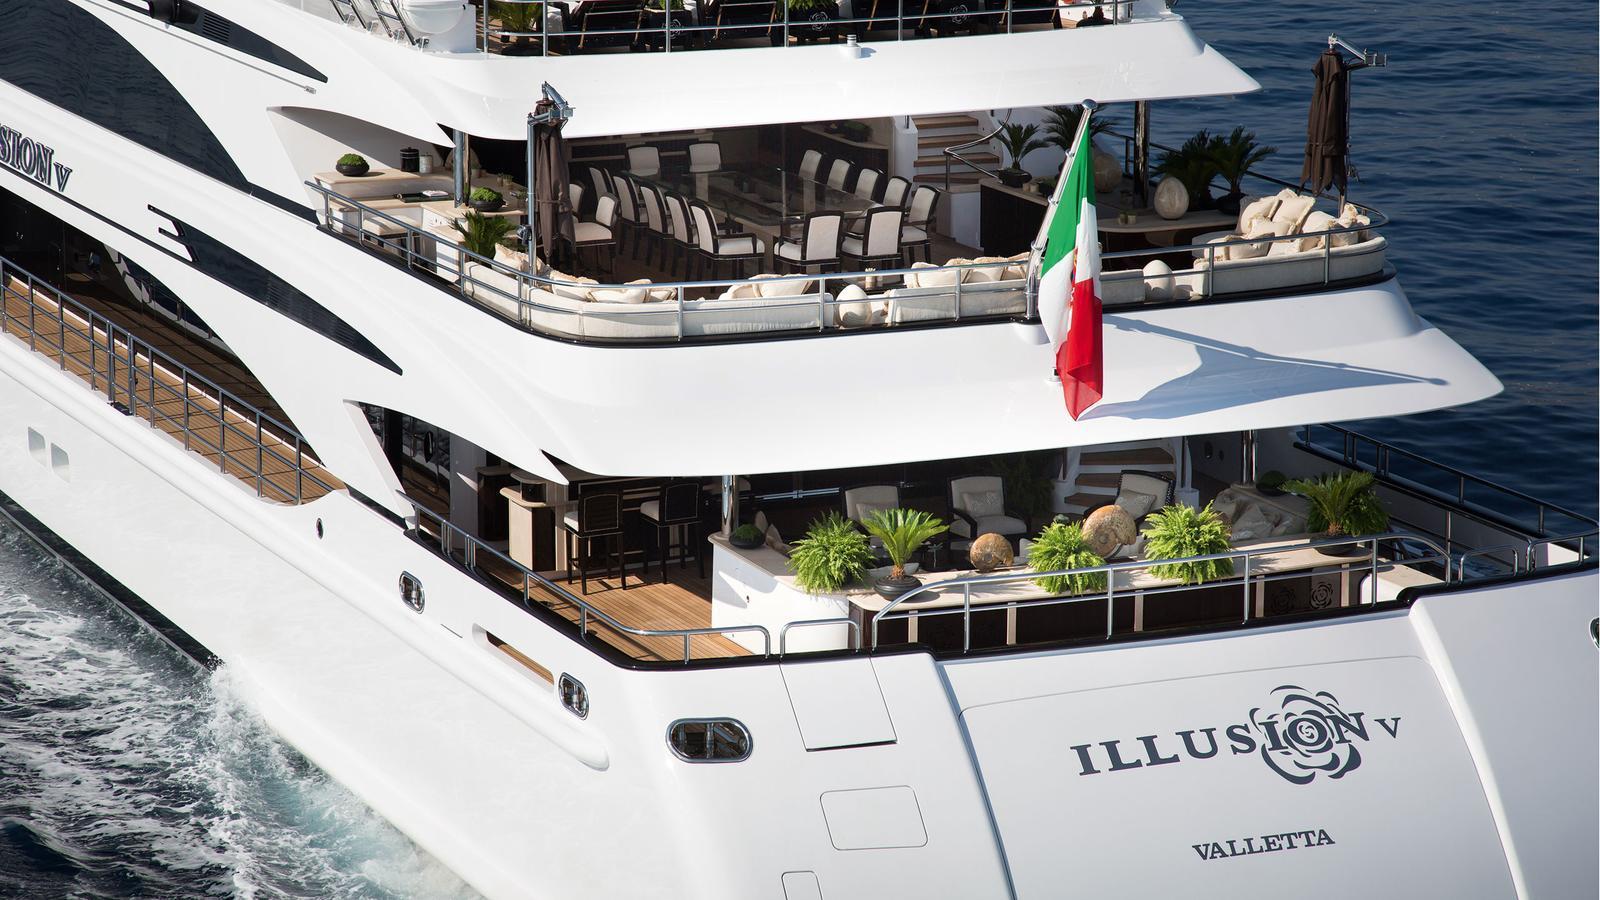 illusion-v-motor-yacht-benetti-2014-58m-stern